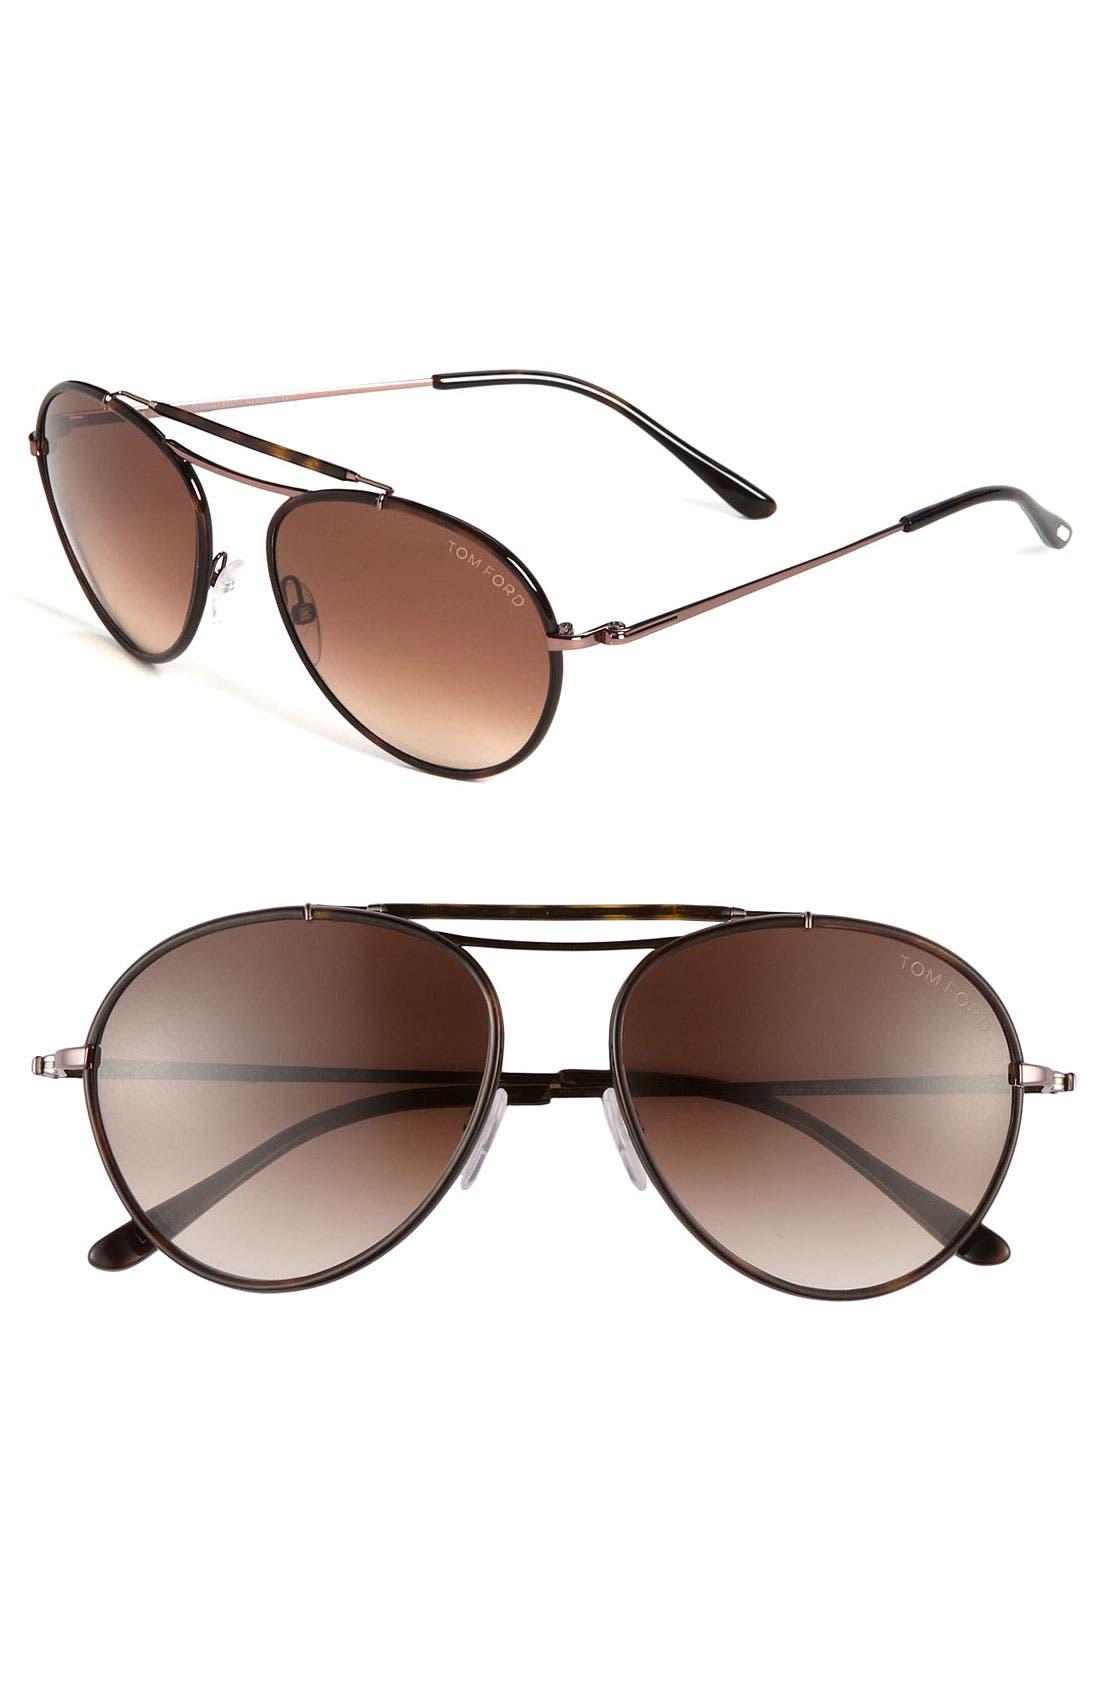 Main Image - Tom Ford Aviator Sunglasses